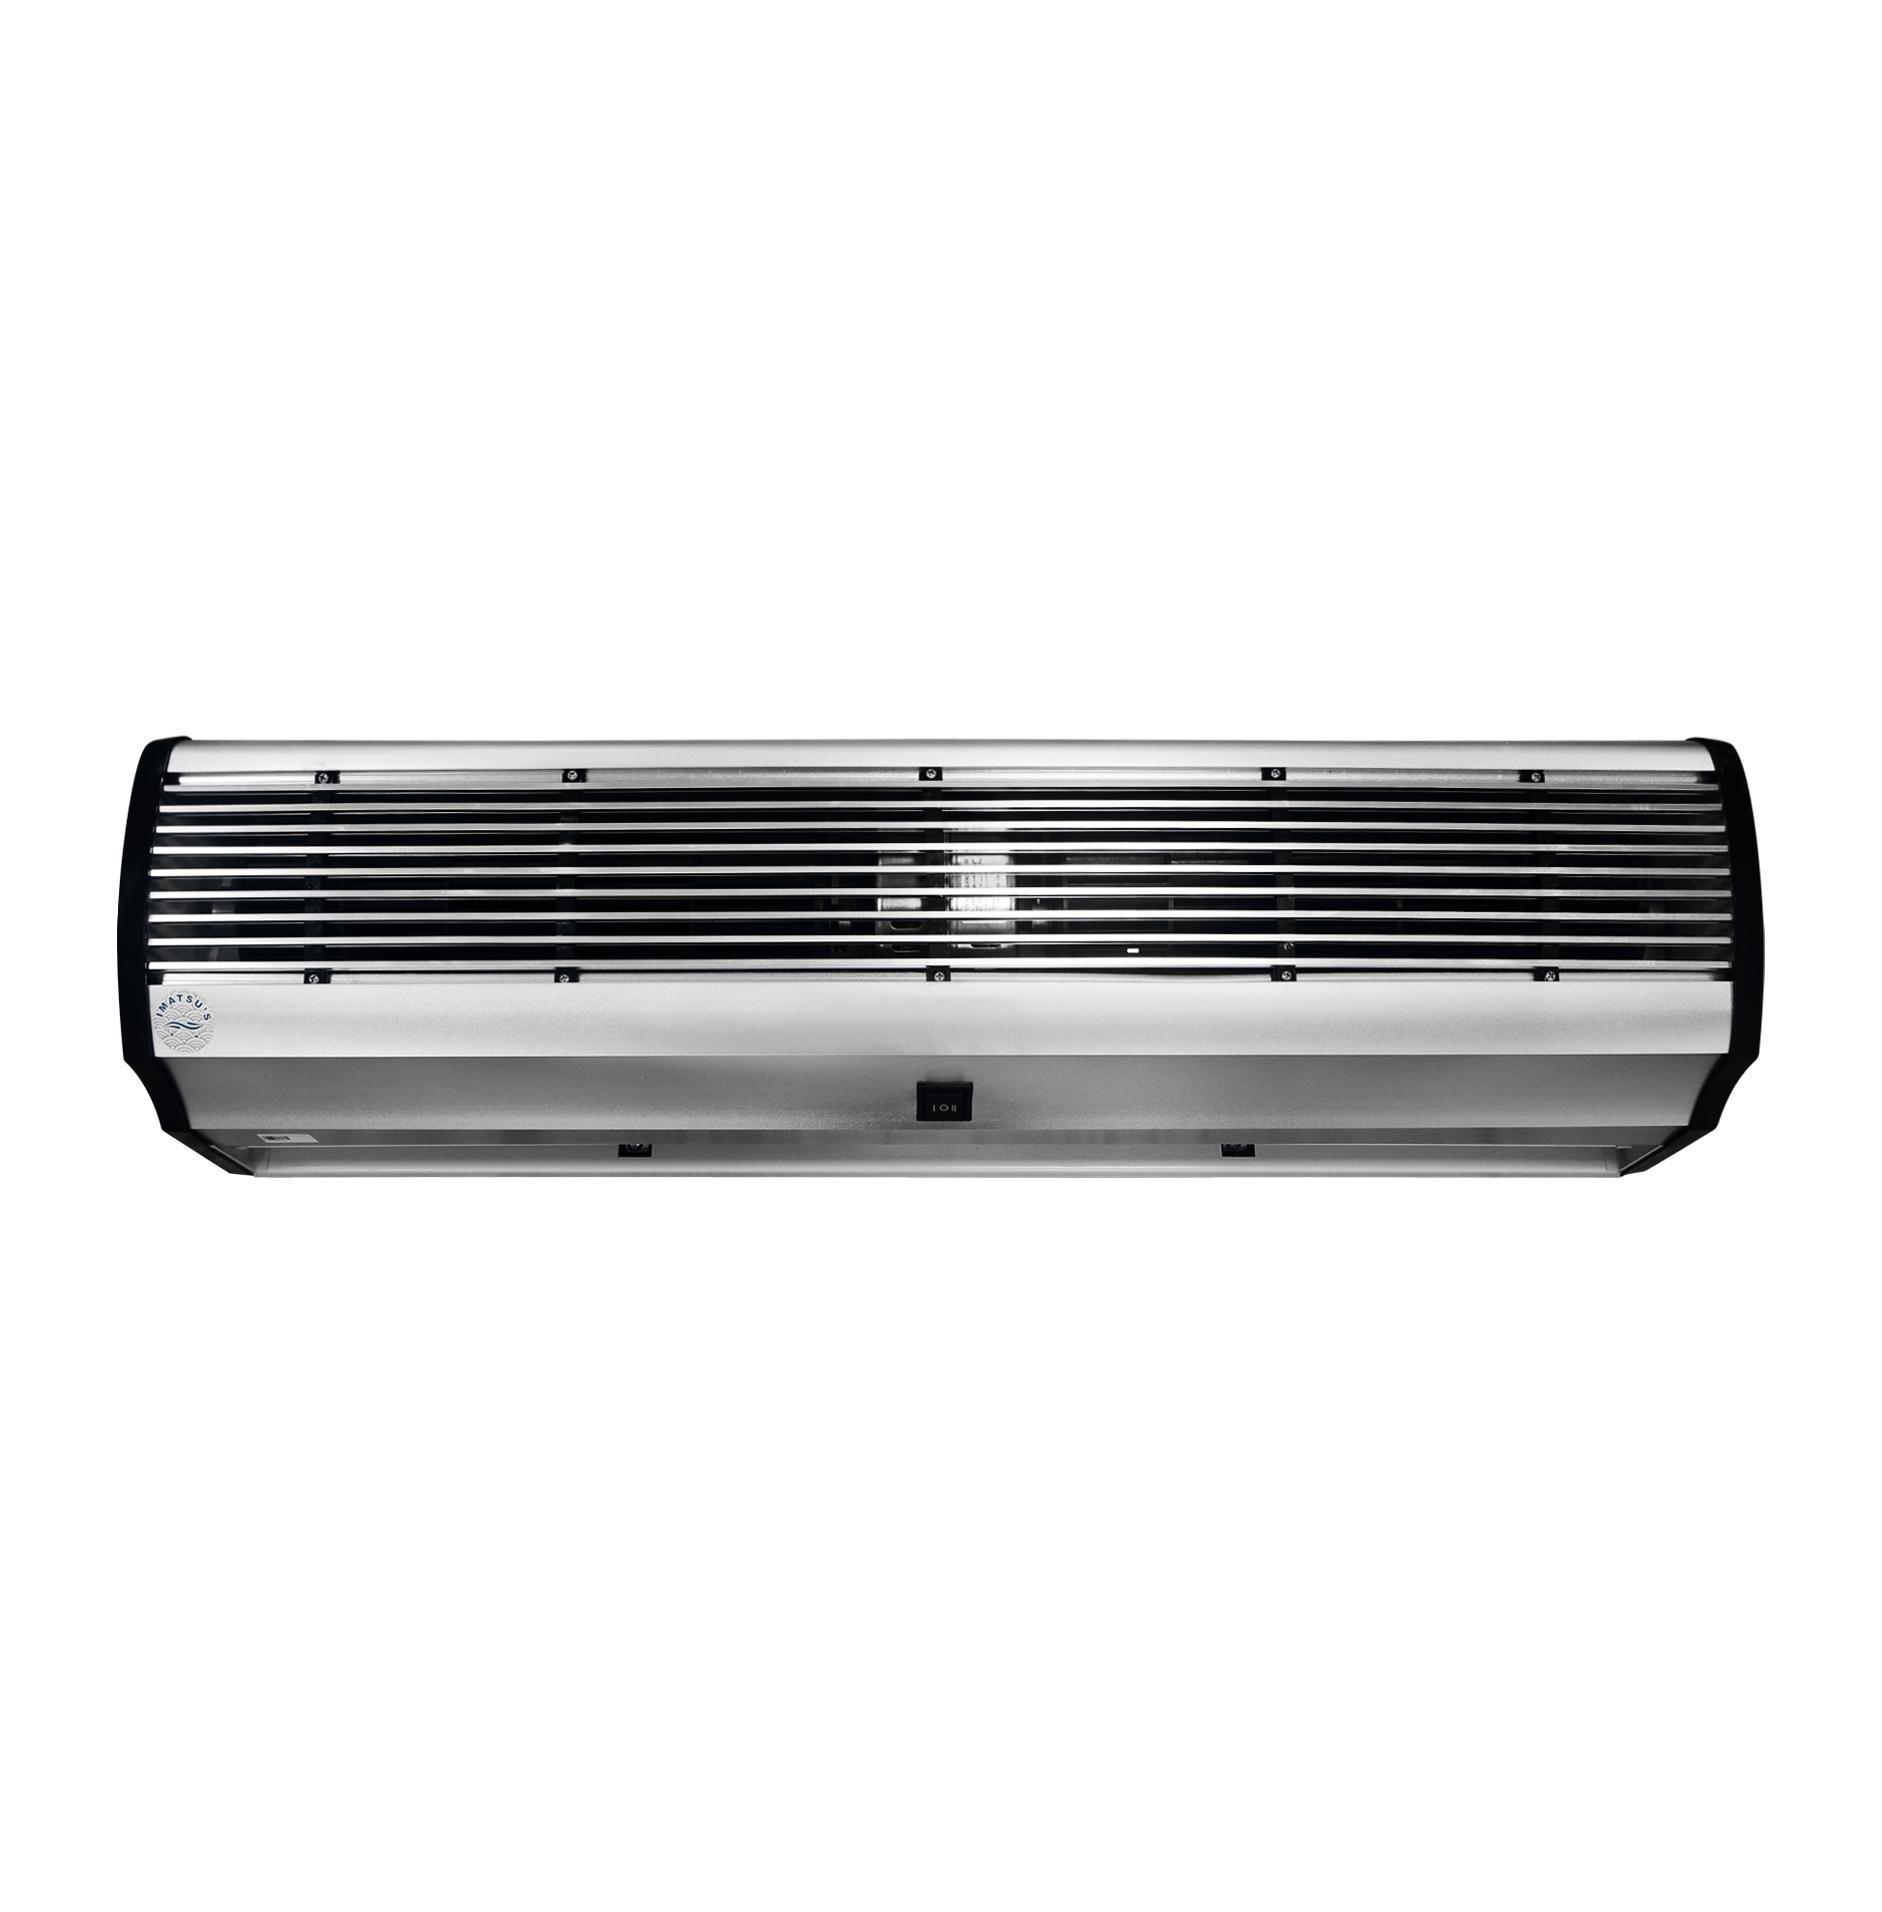 Air Curtain Blower Imatsu AC-FM-S1510G5-CY Angin Toko Gedung Kantor Hotel Pintu Masuk Nyaman Sejuk Segar Fresh Tirai Udara